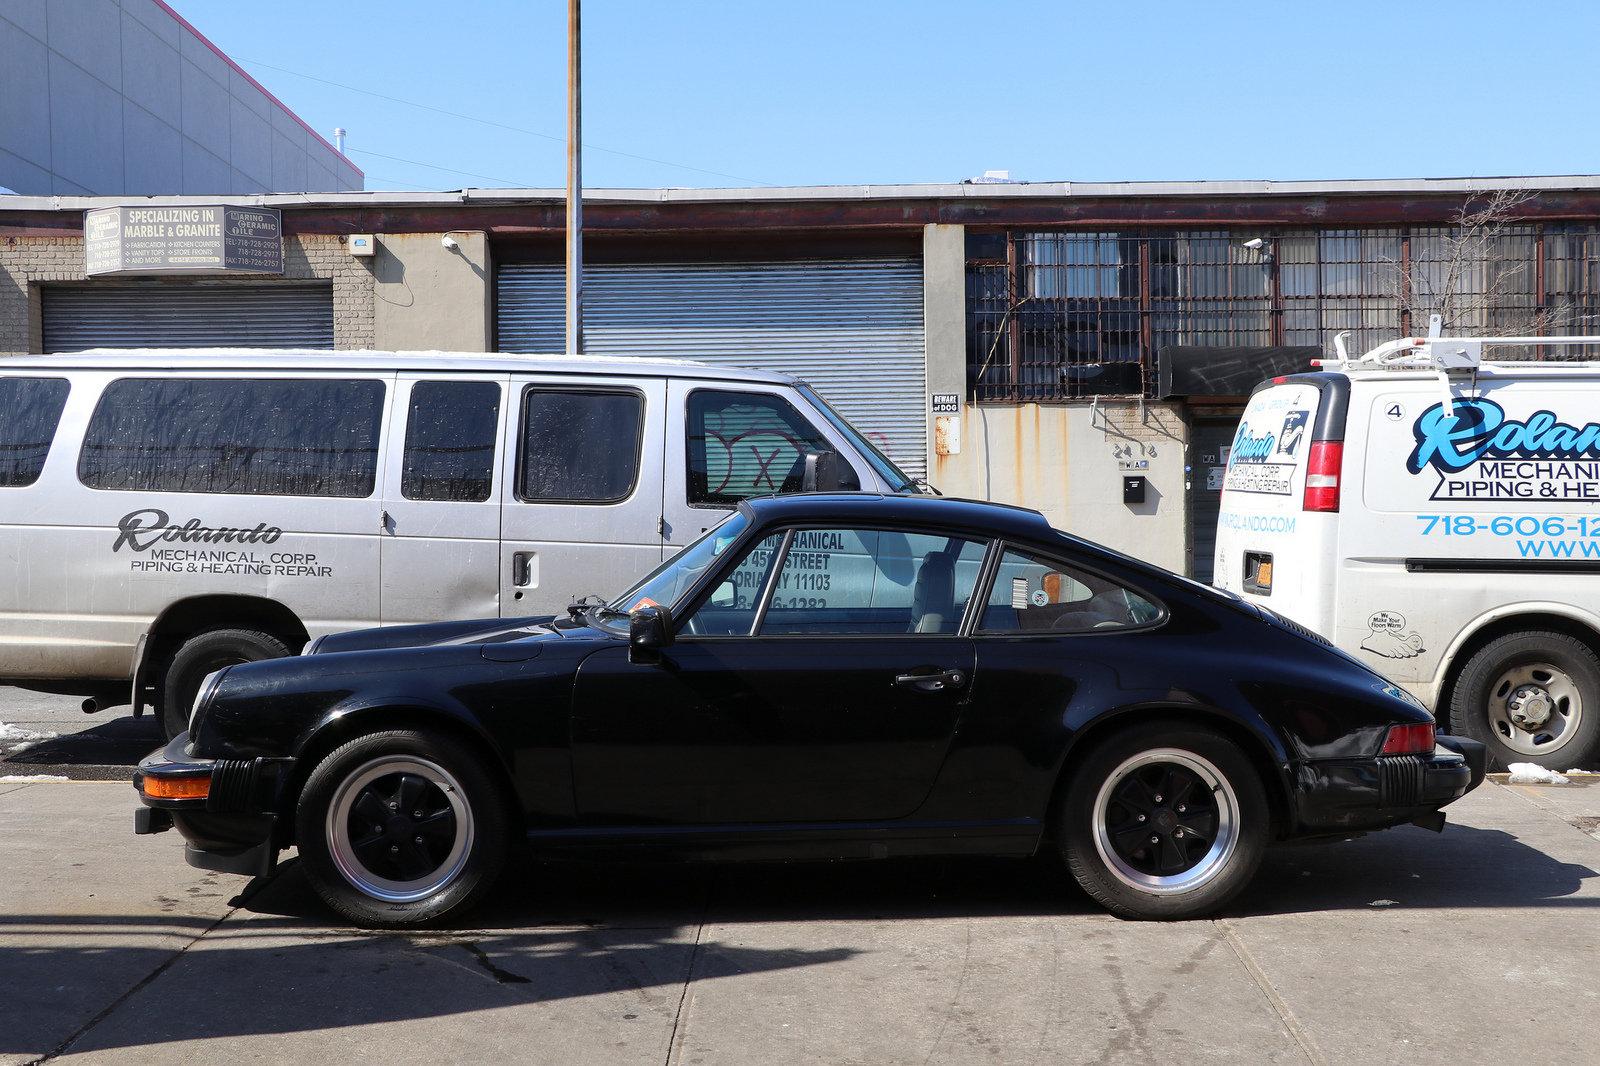 PORSCHE 911SC COUPE 1983 BLACK For Sale (picture 1 of 4)